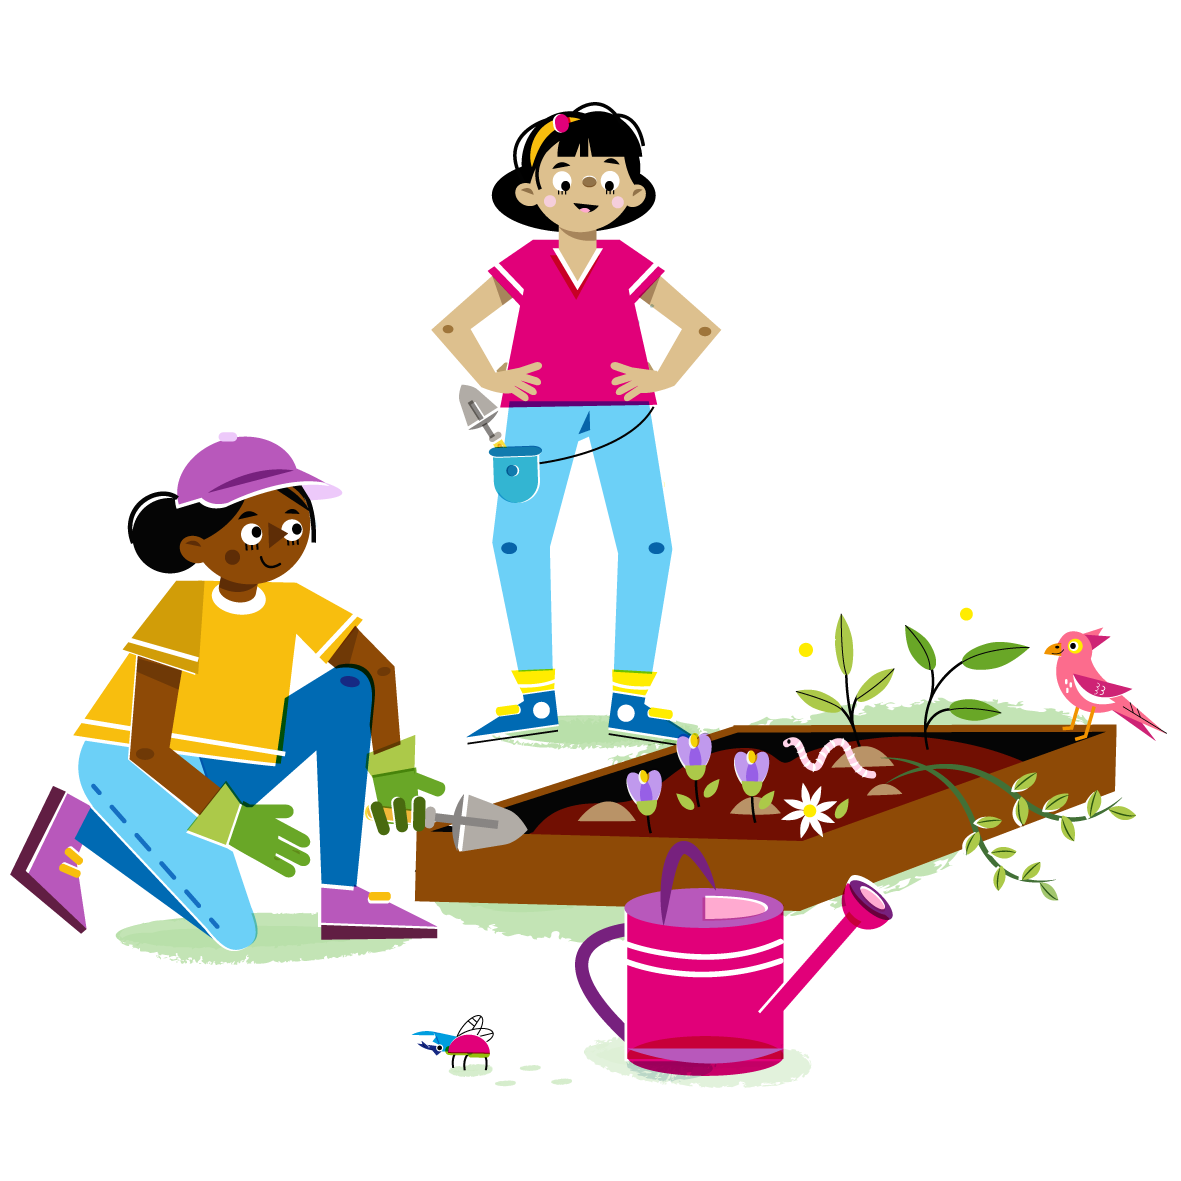 Gardeners - Vector Illustration © Emeline Barrea, All rights reserved